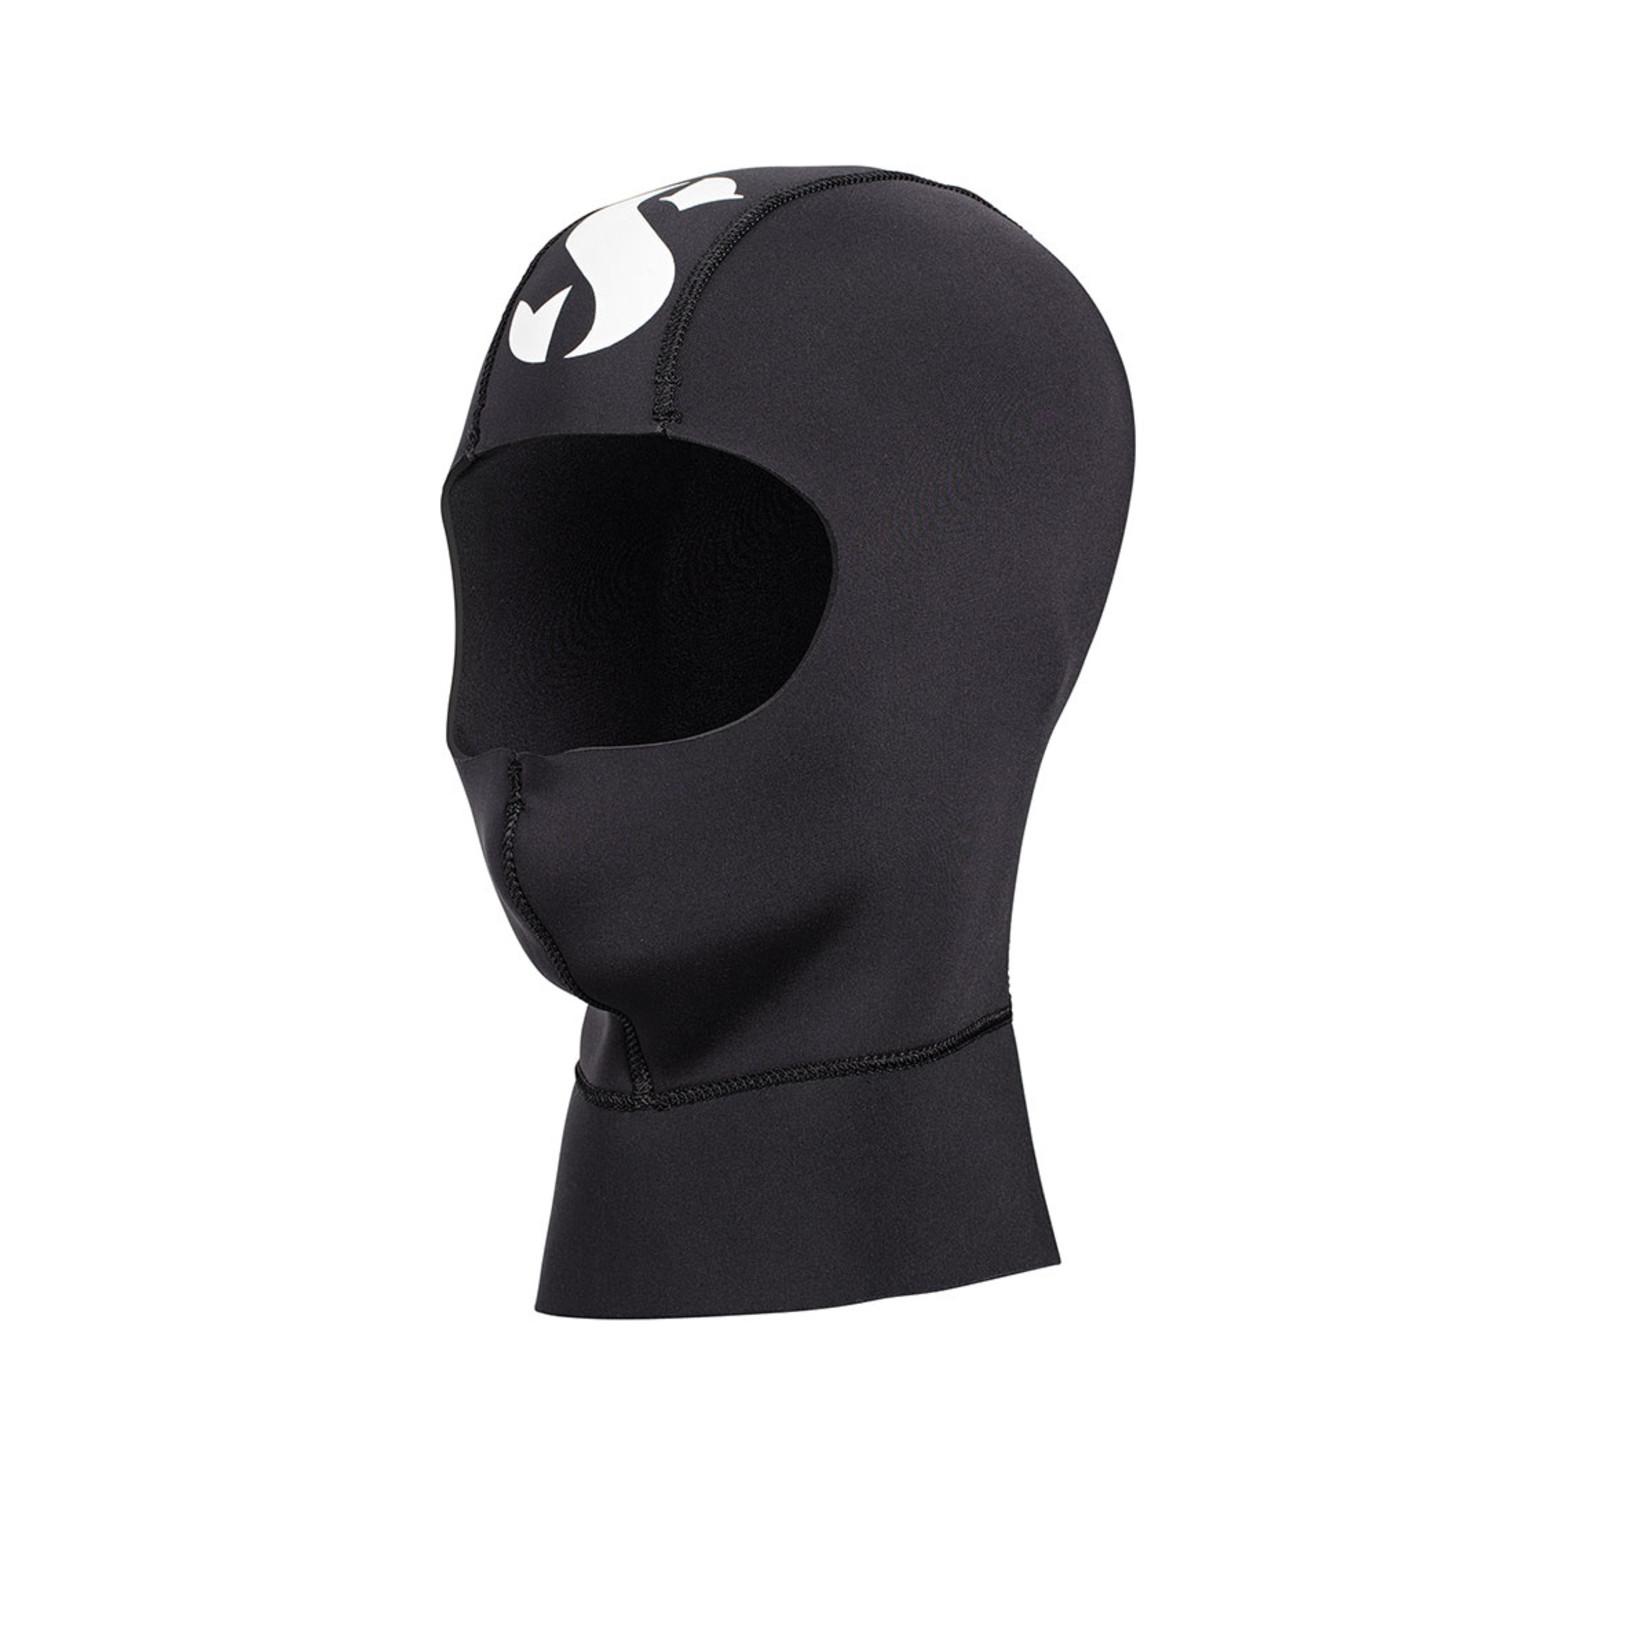 Scubapro EVERFLEX Hood 3/5 mm